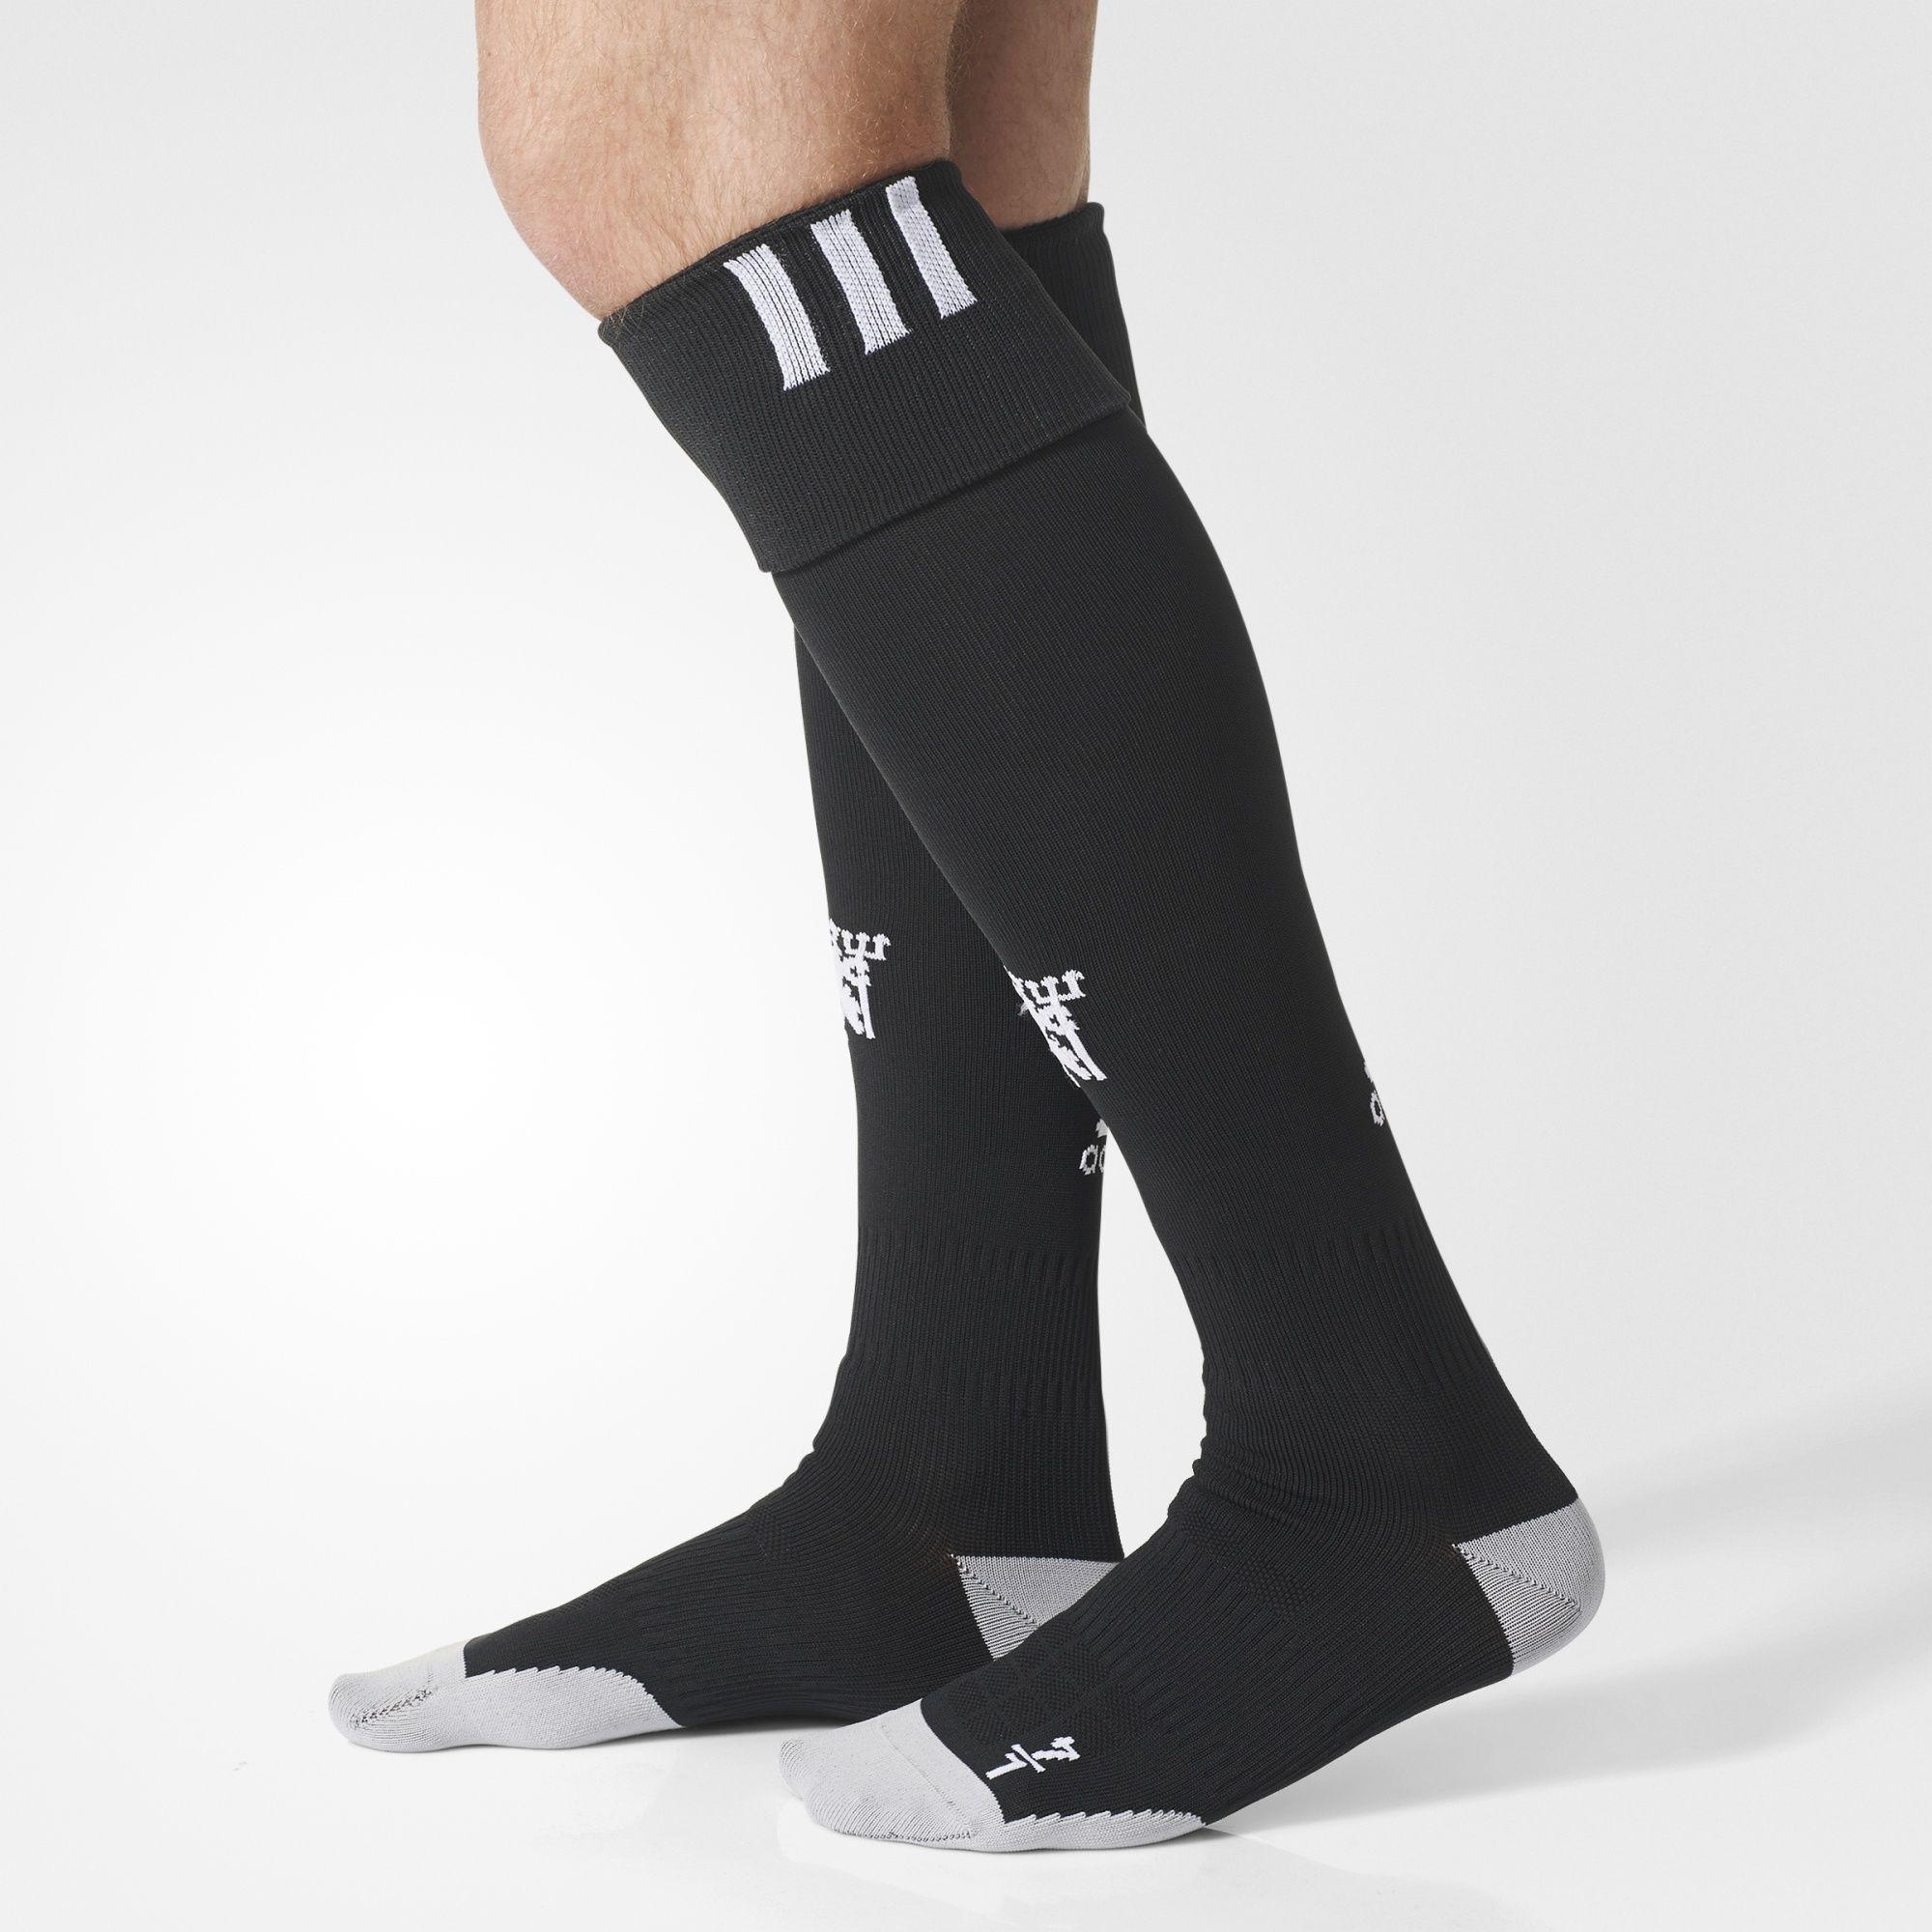 Man Utd away socks 2017/18